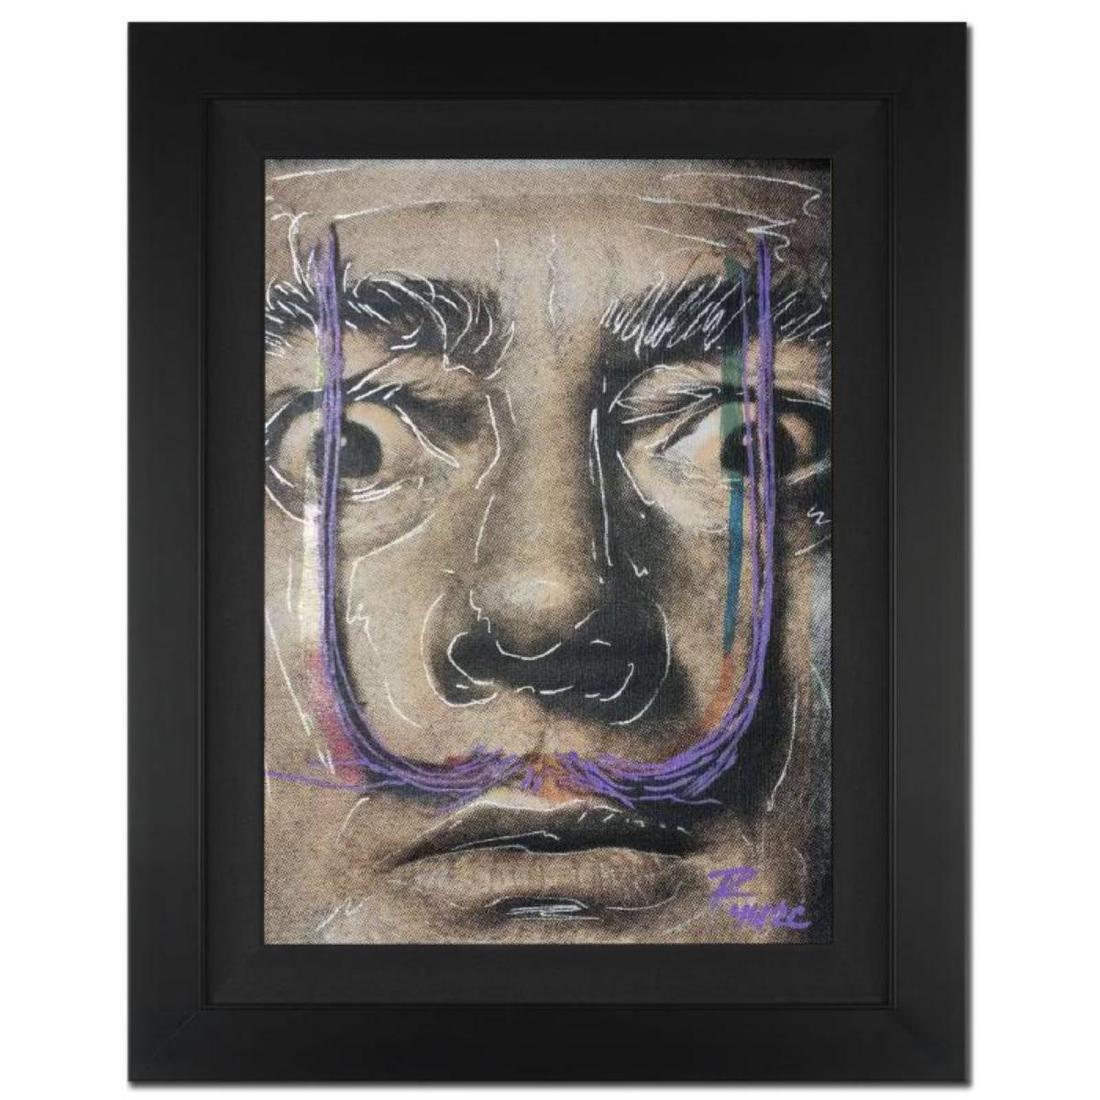 Ringo Daniel Funes - (Protege of Andy Warhol's